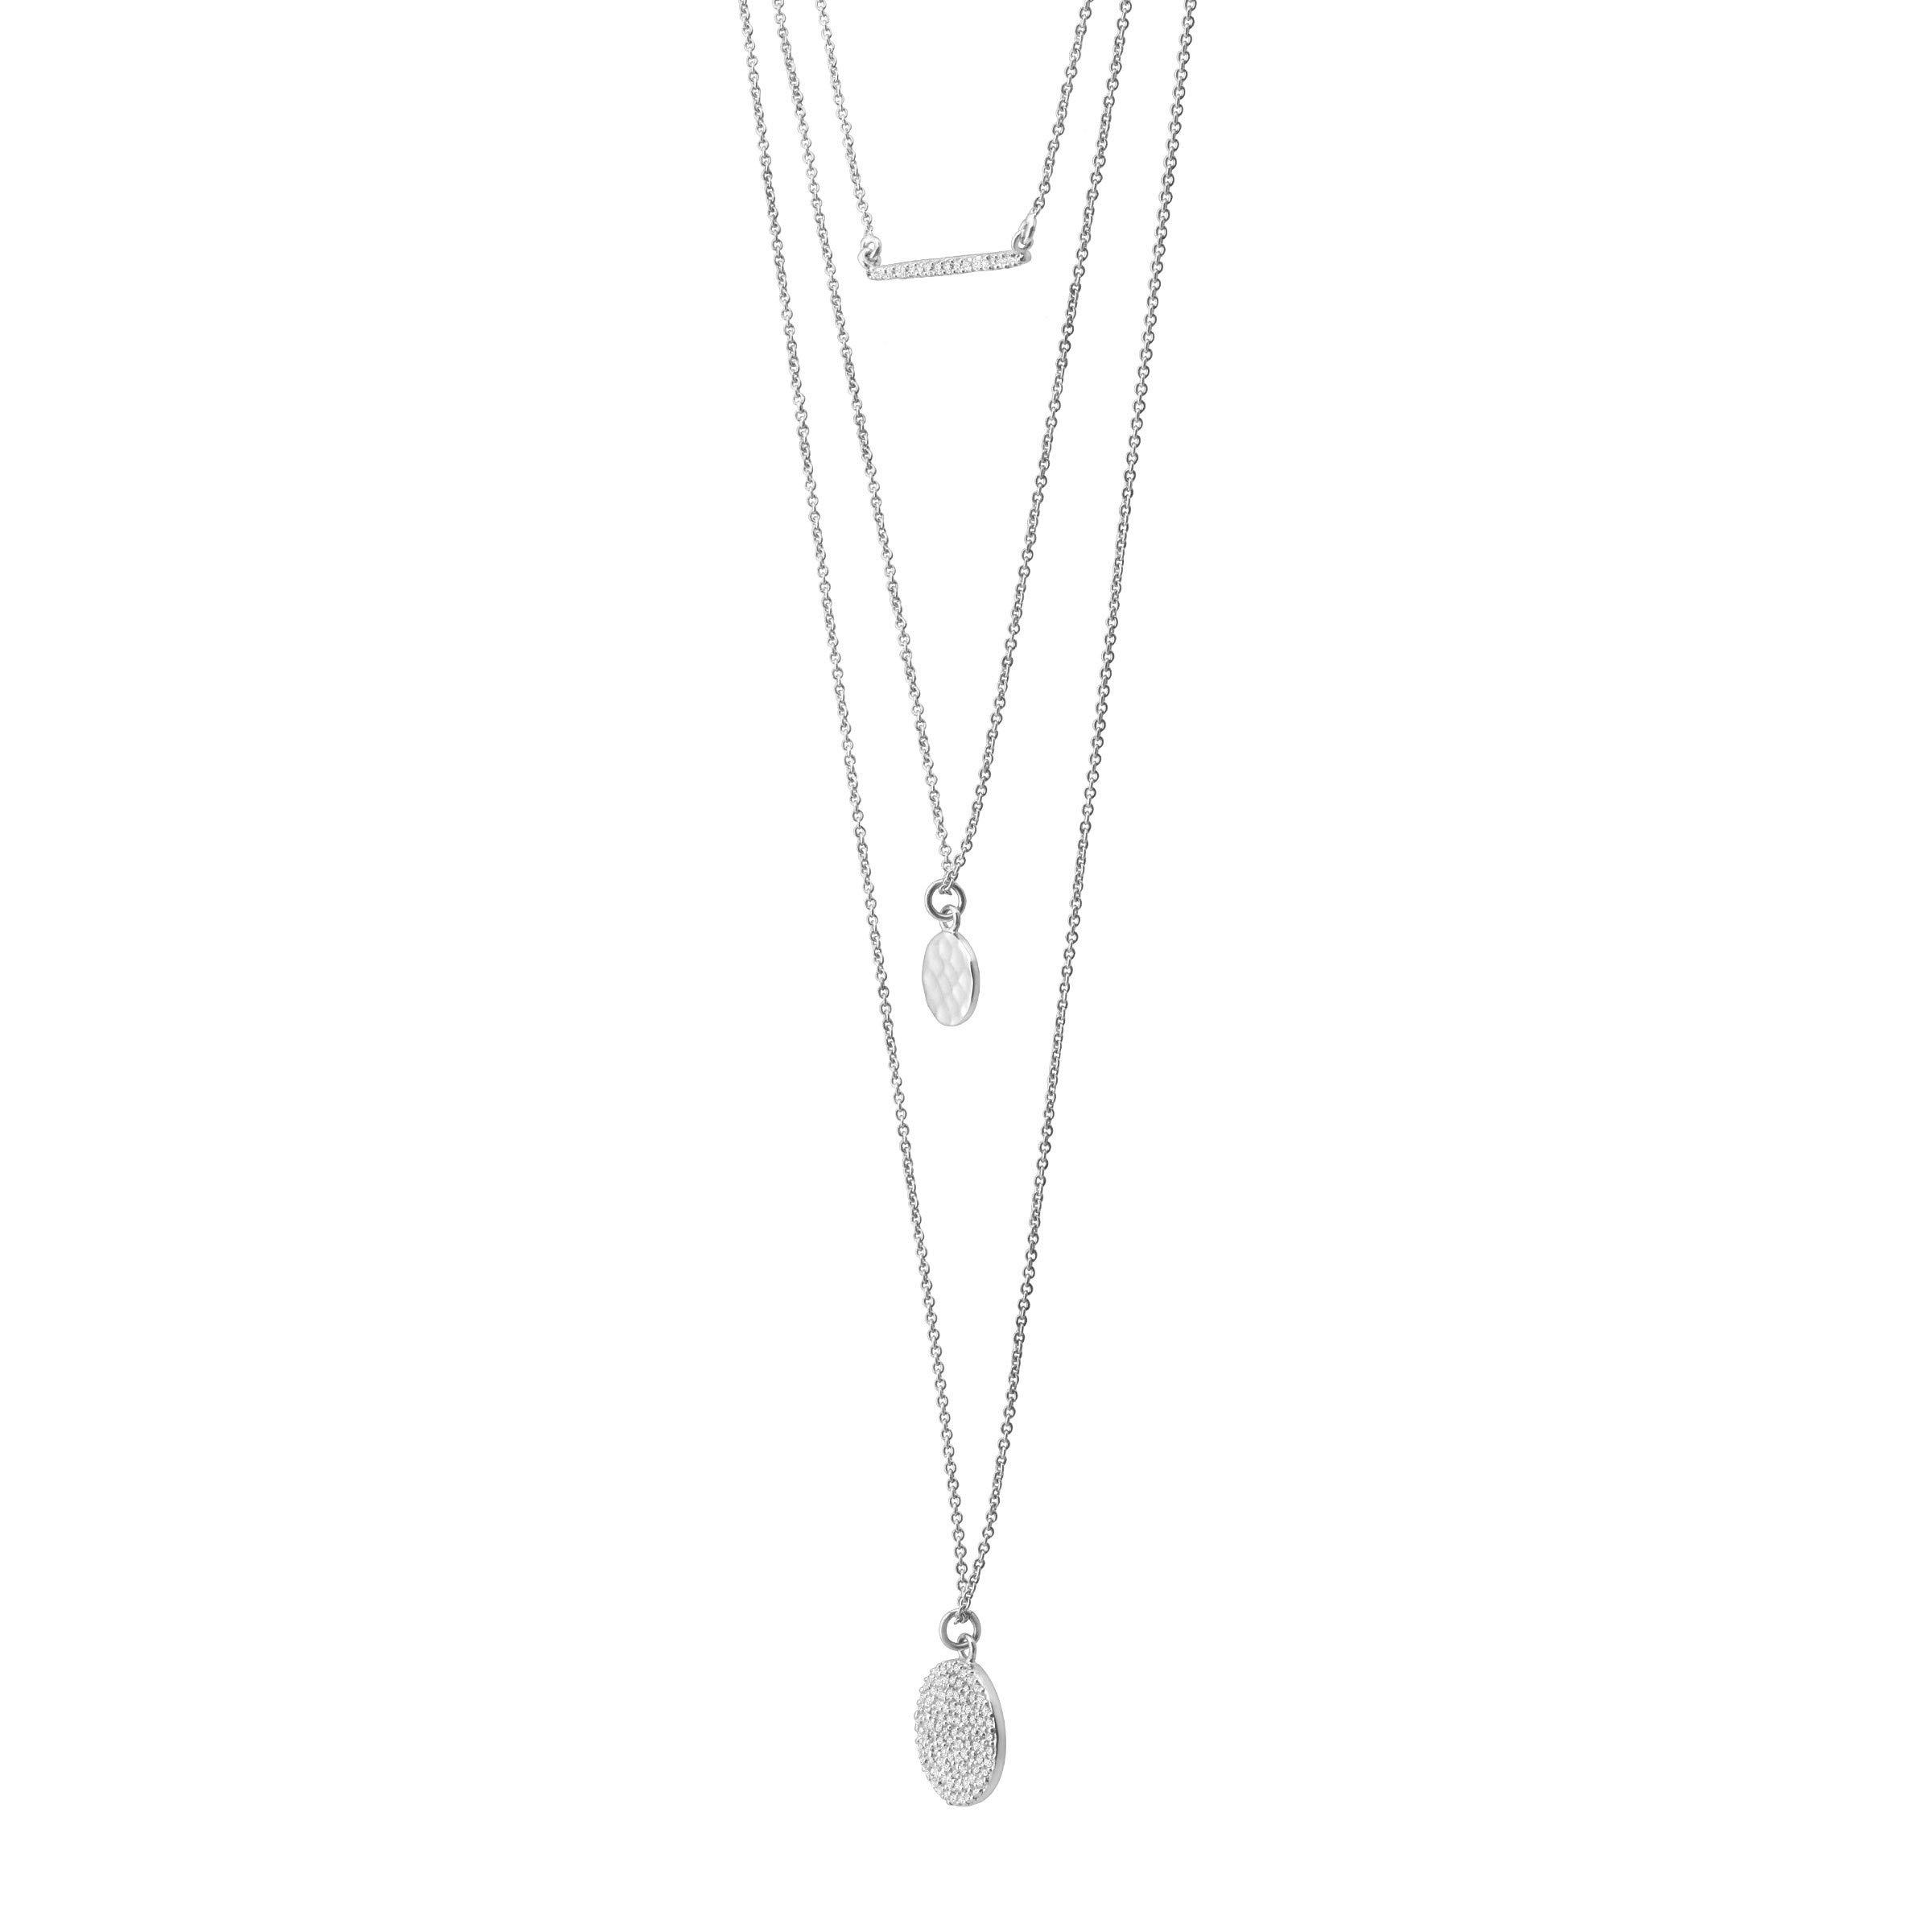 Silpada 'Triple Drop' 1/2 ct Cubic Zirconia Necklace in Sterling Silver by Silpada (Image #2)